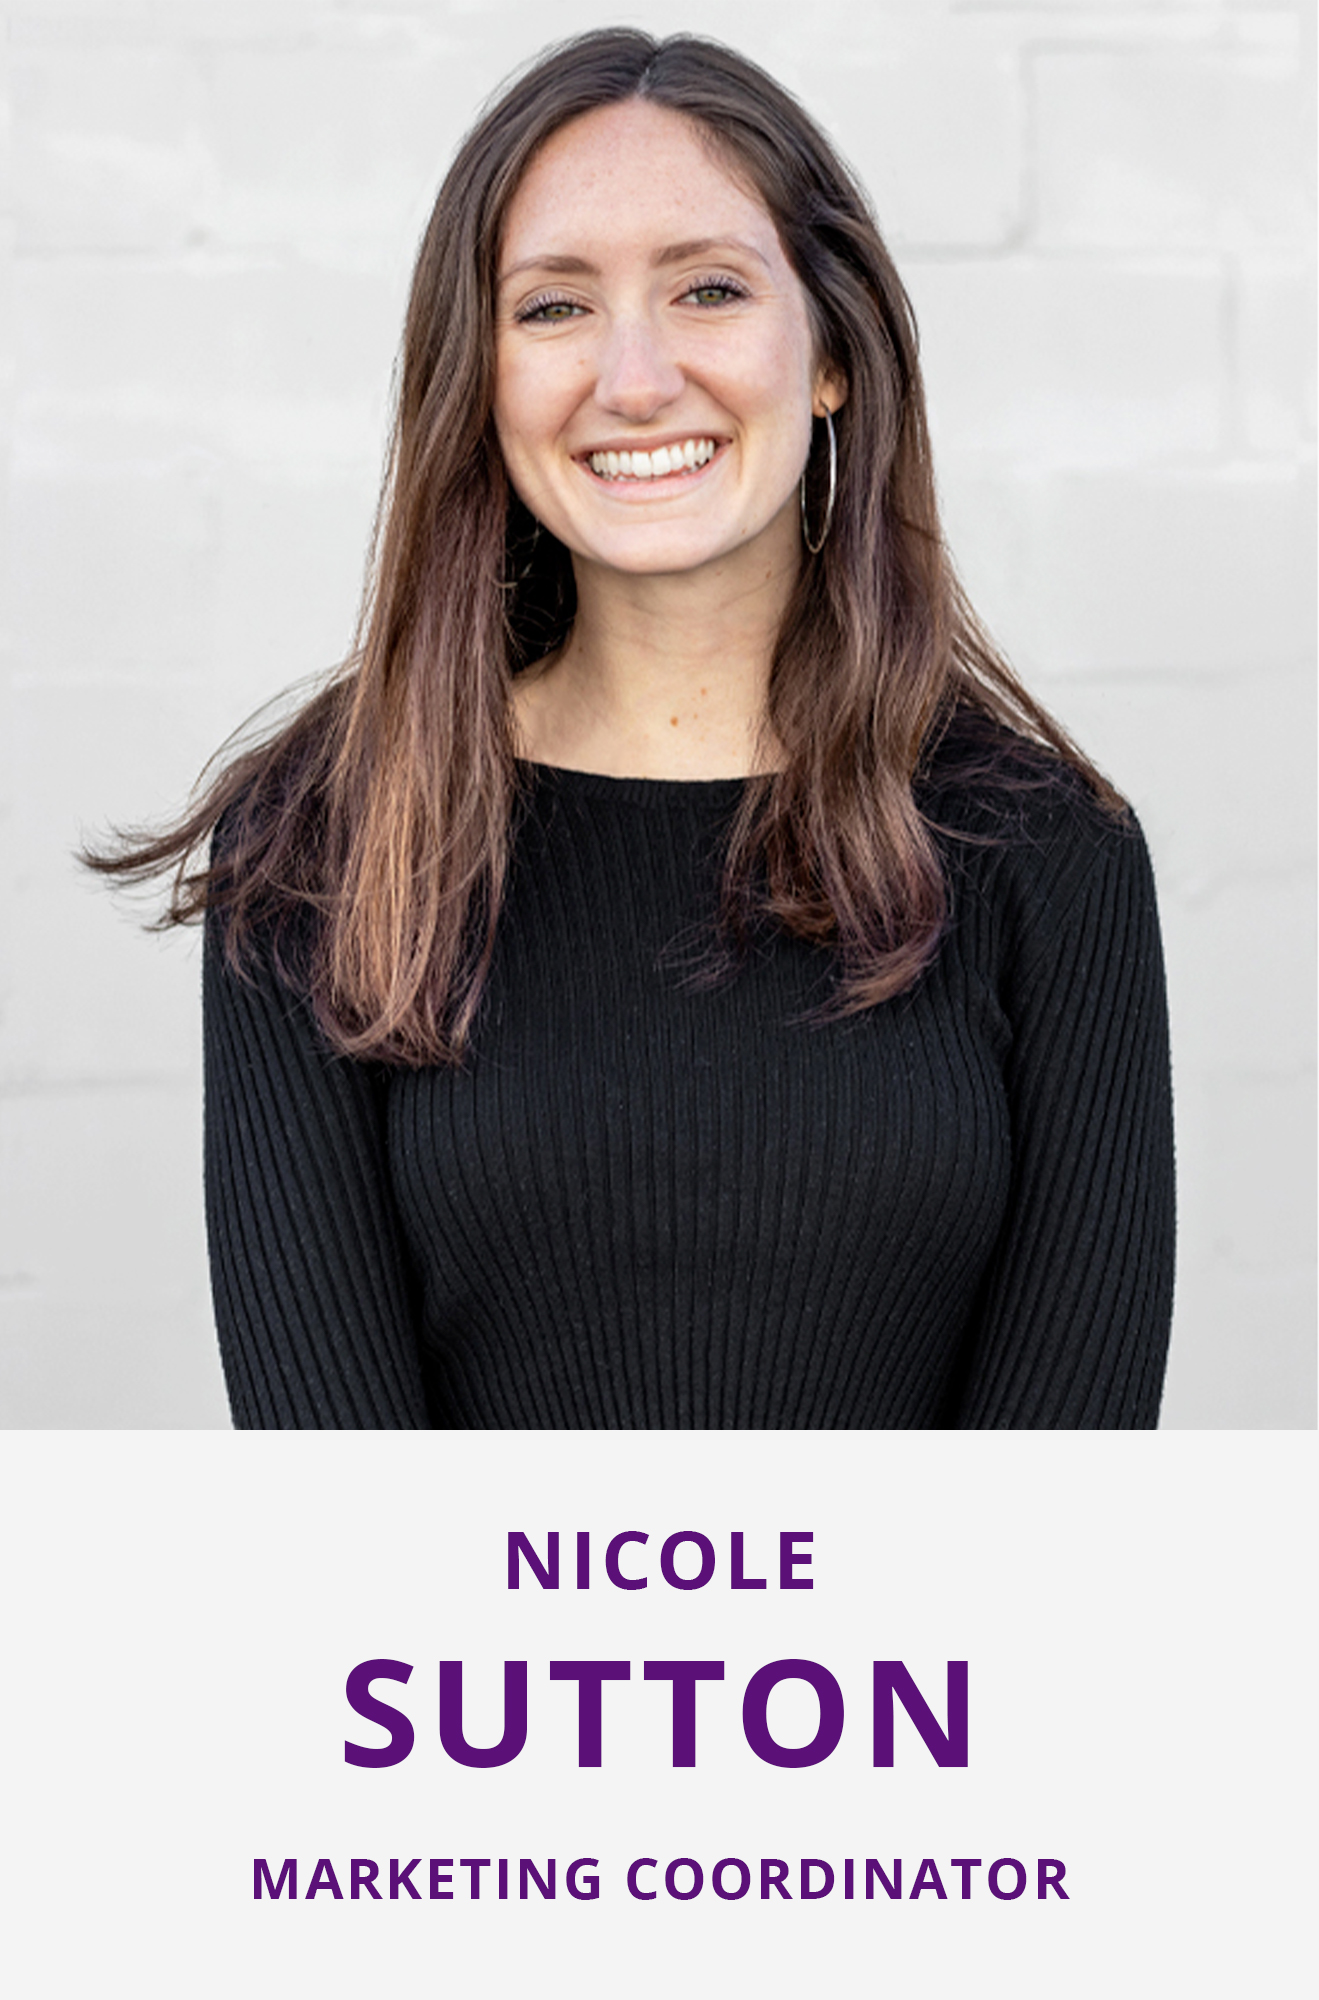 Nicole Sutton